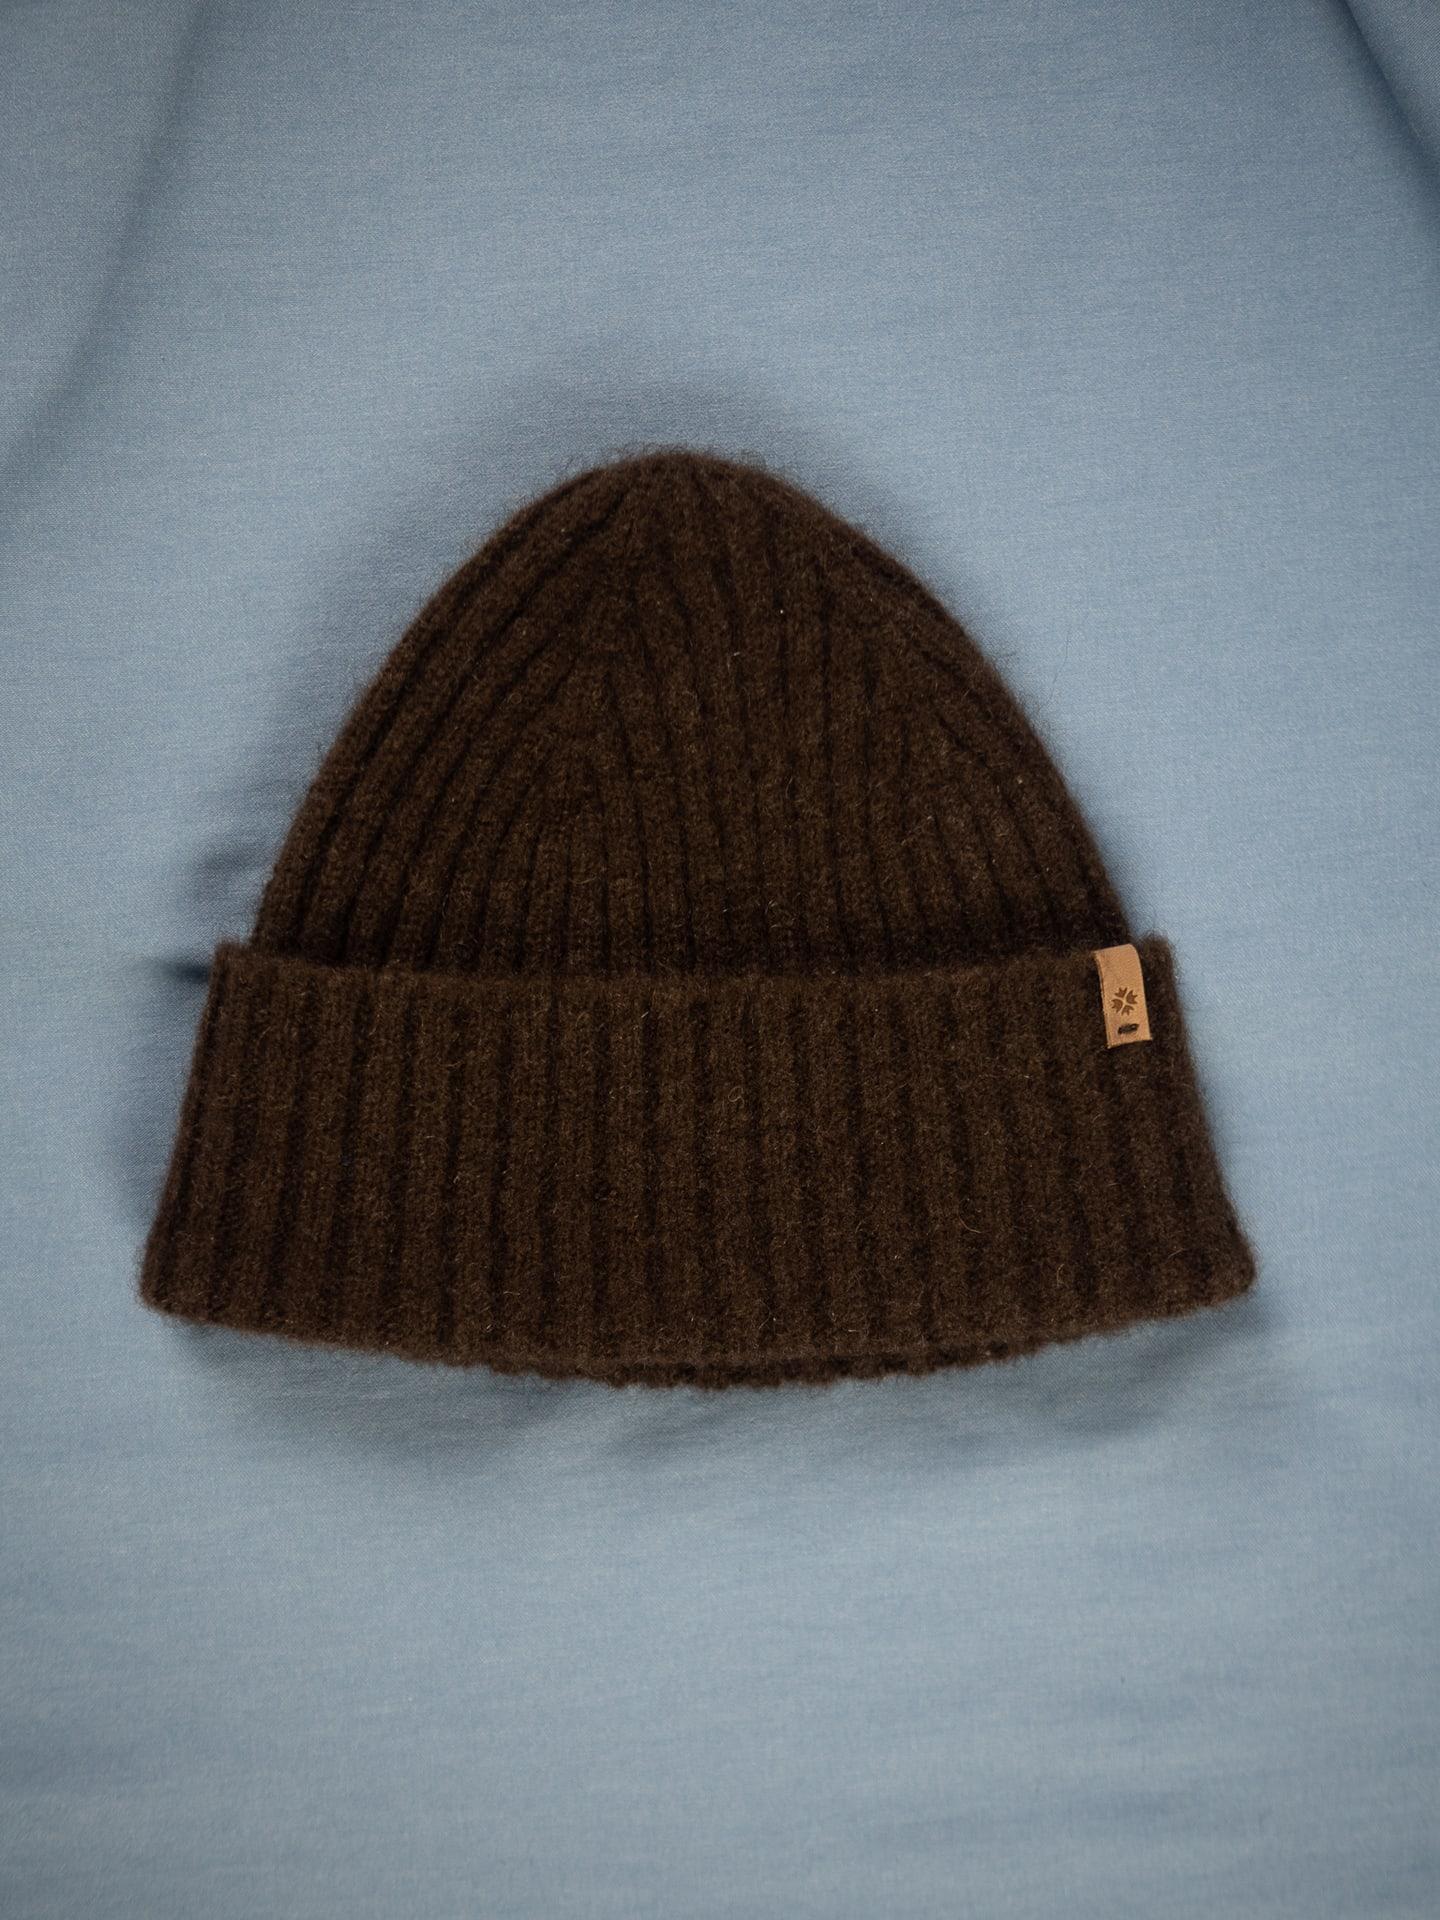 Yak fitted rib hat - dark brown